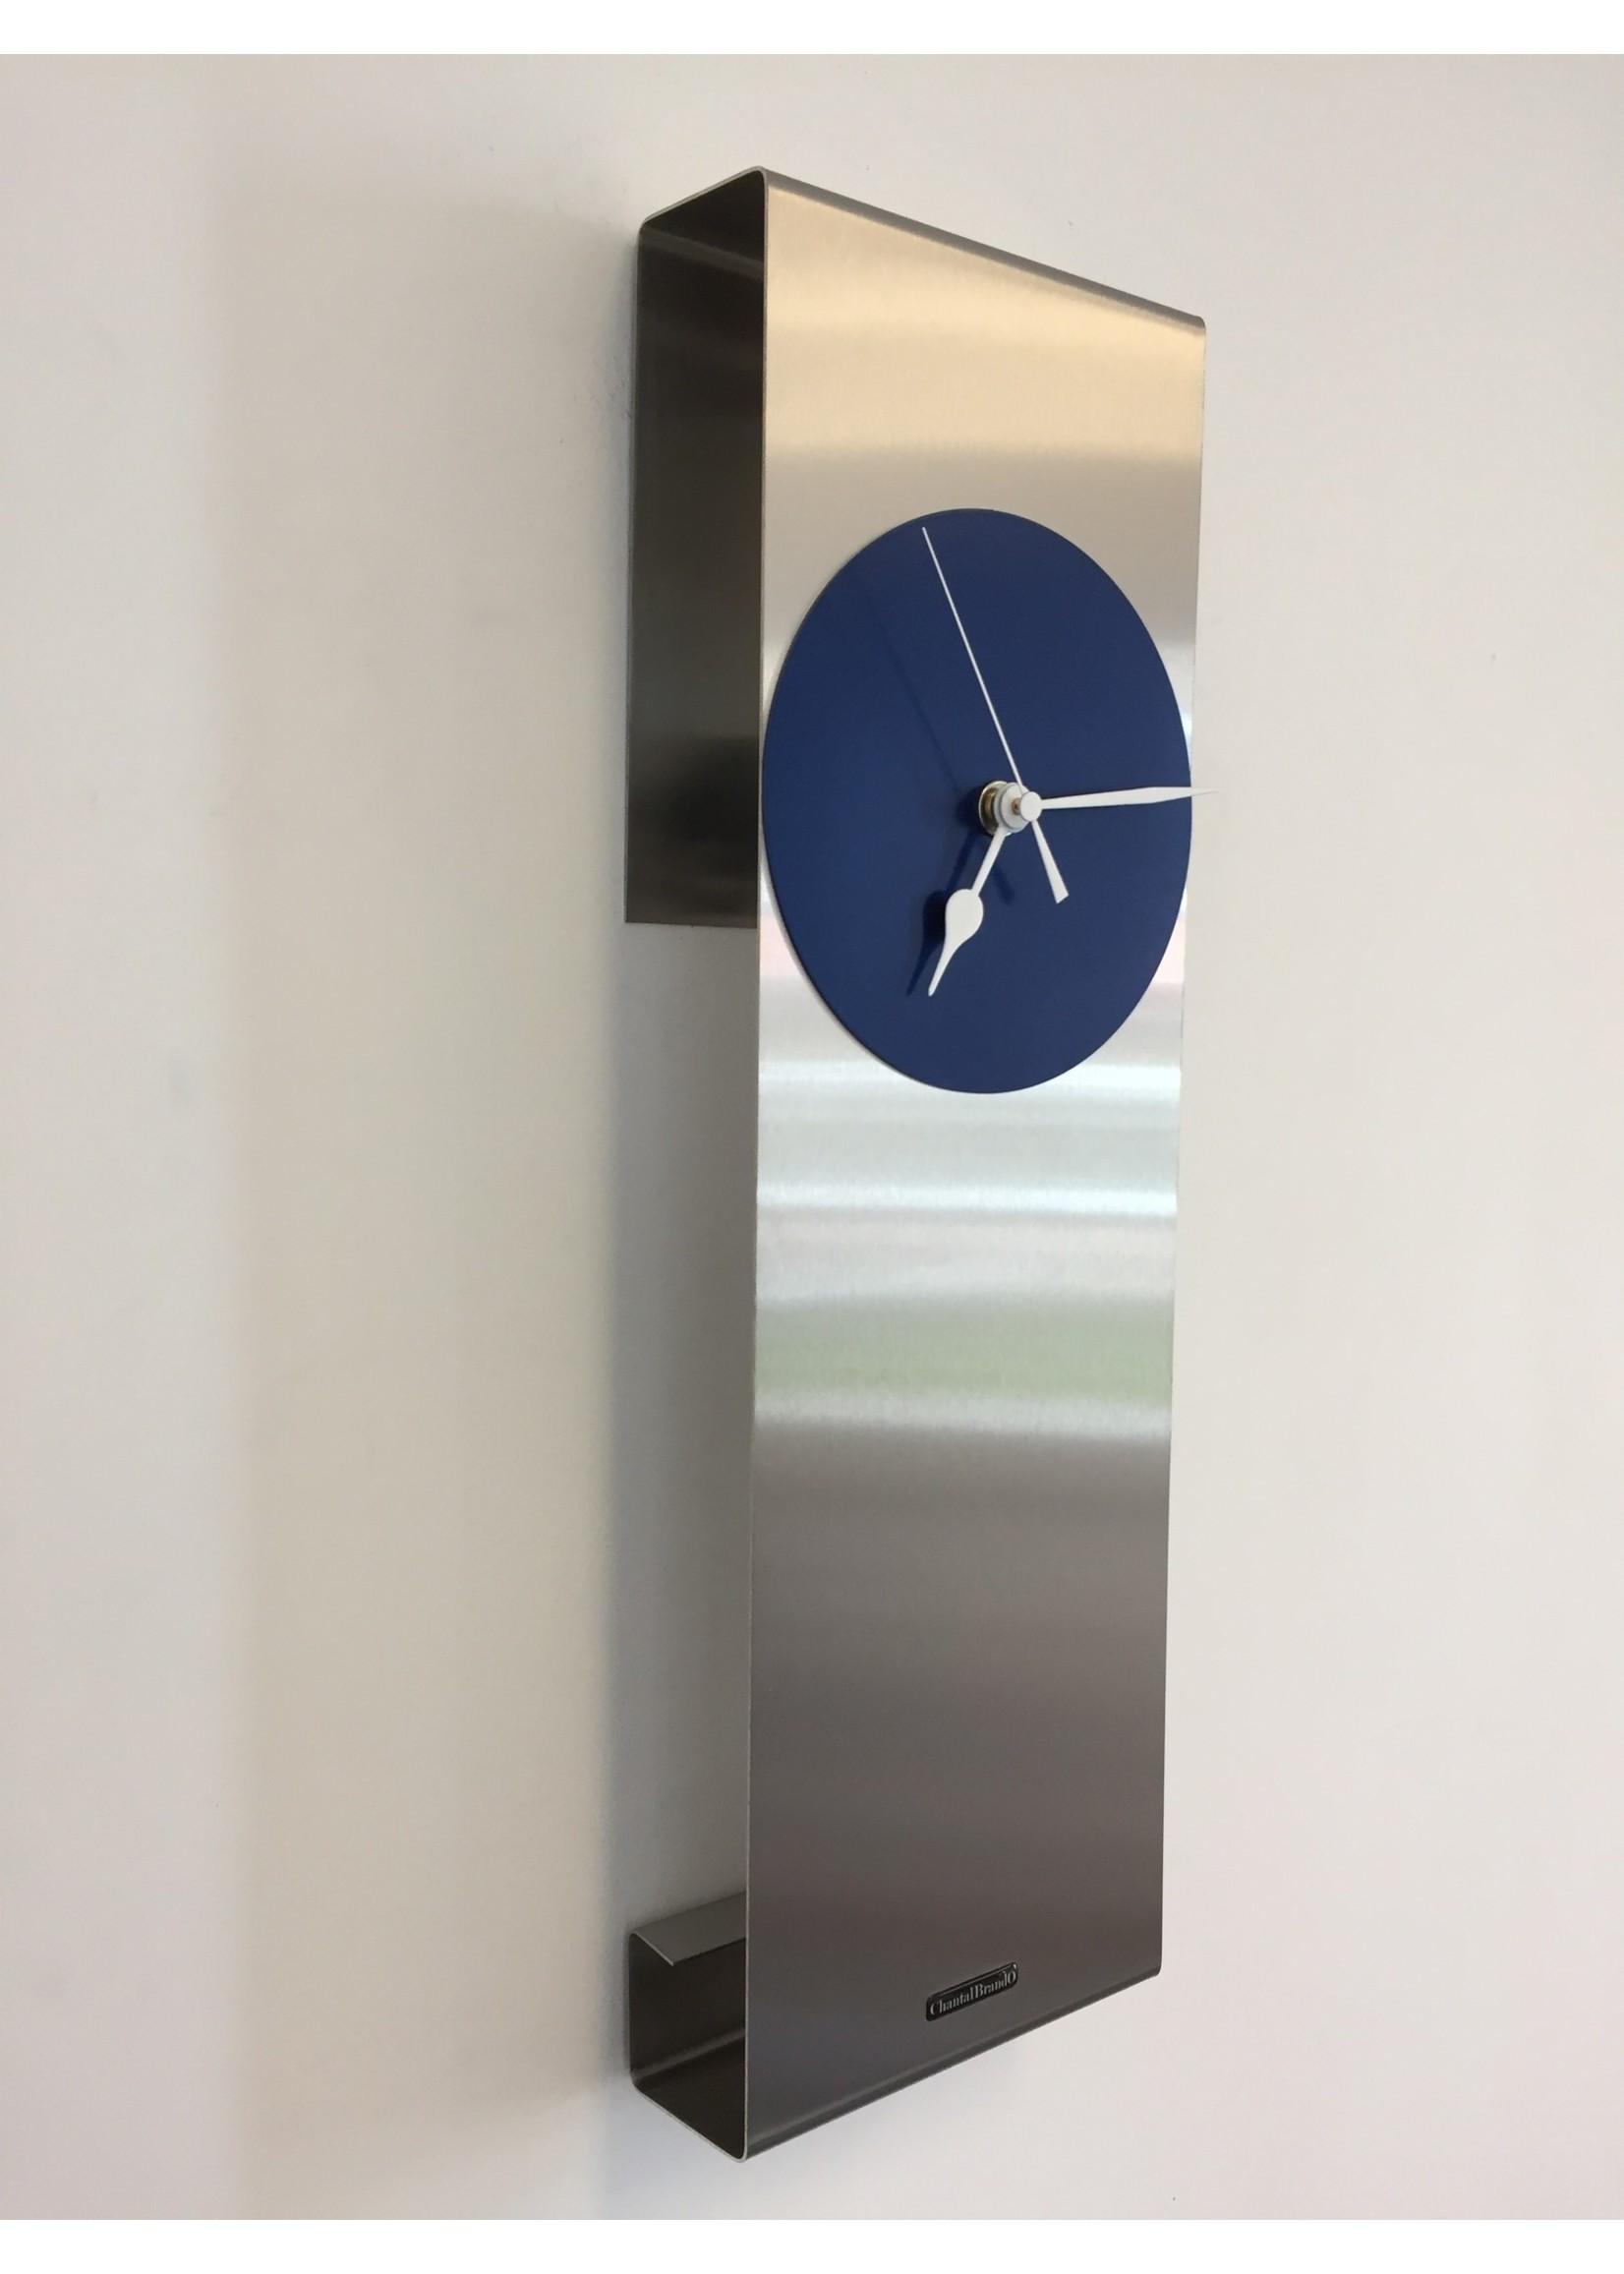 Klokkendiscounter Wandklok Mahattan Blue Modern design